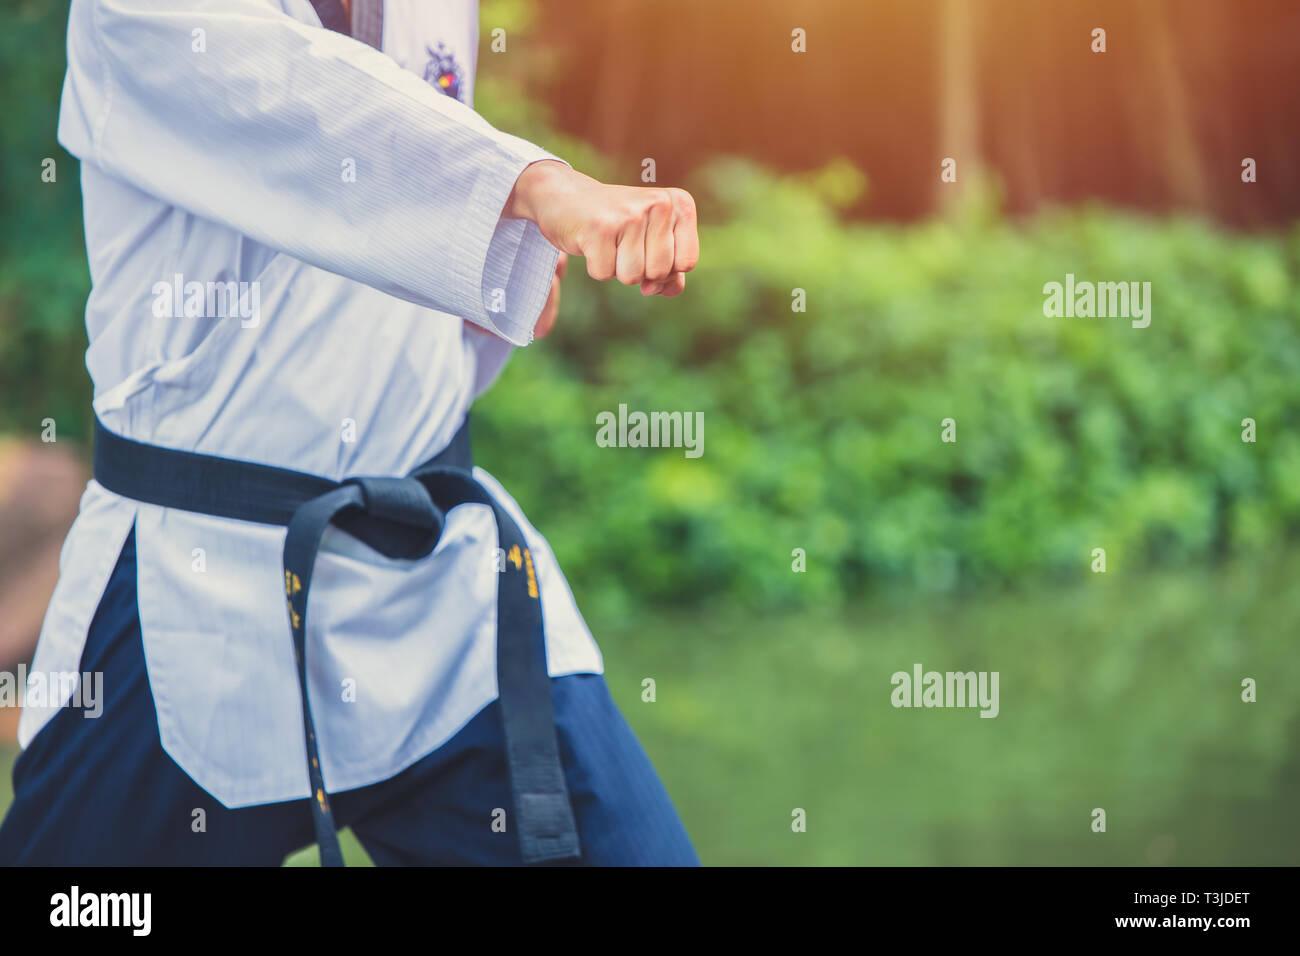 taekwondo man hand fist punching - Stock Image